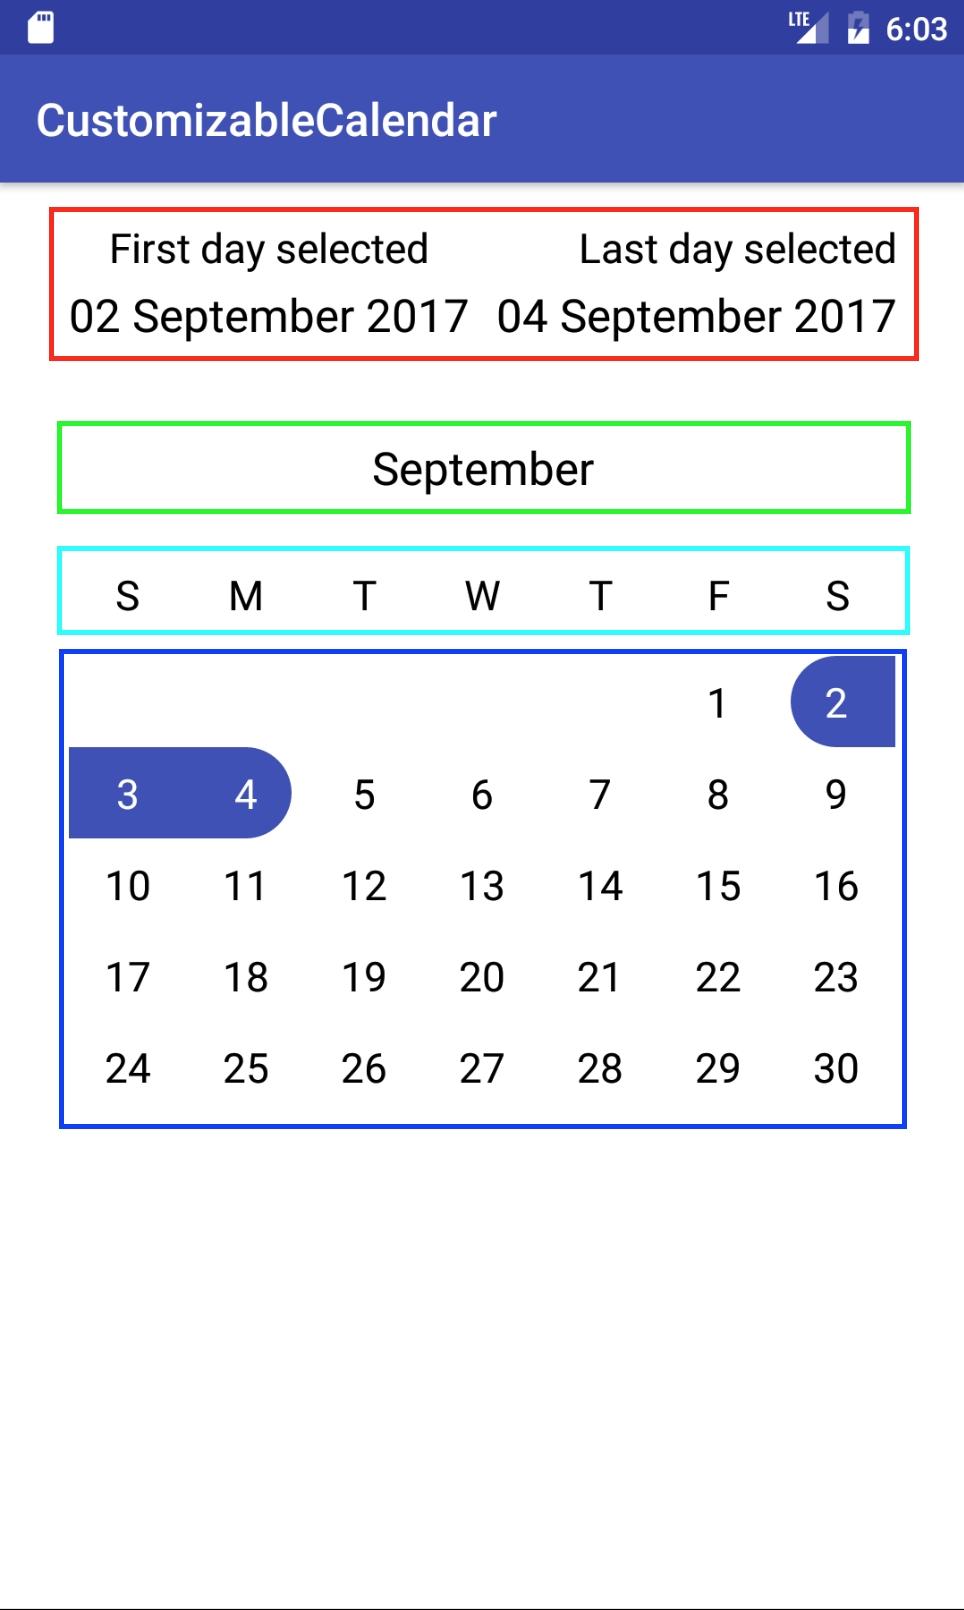 Android Custom Calendar With Events - Patel Prashant - Medium